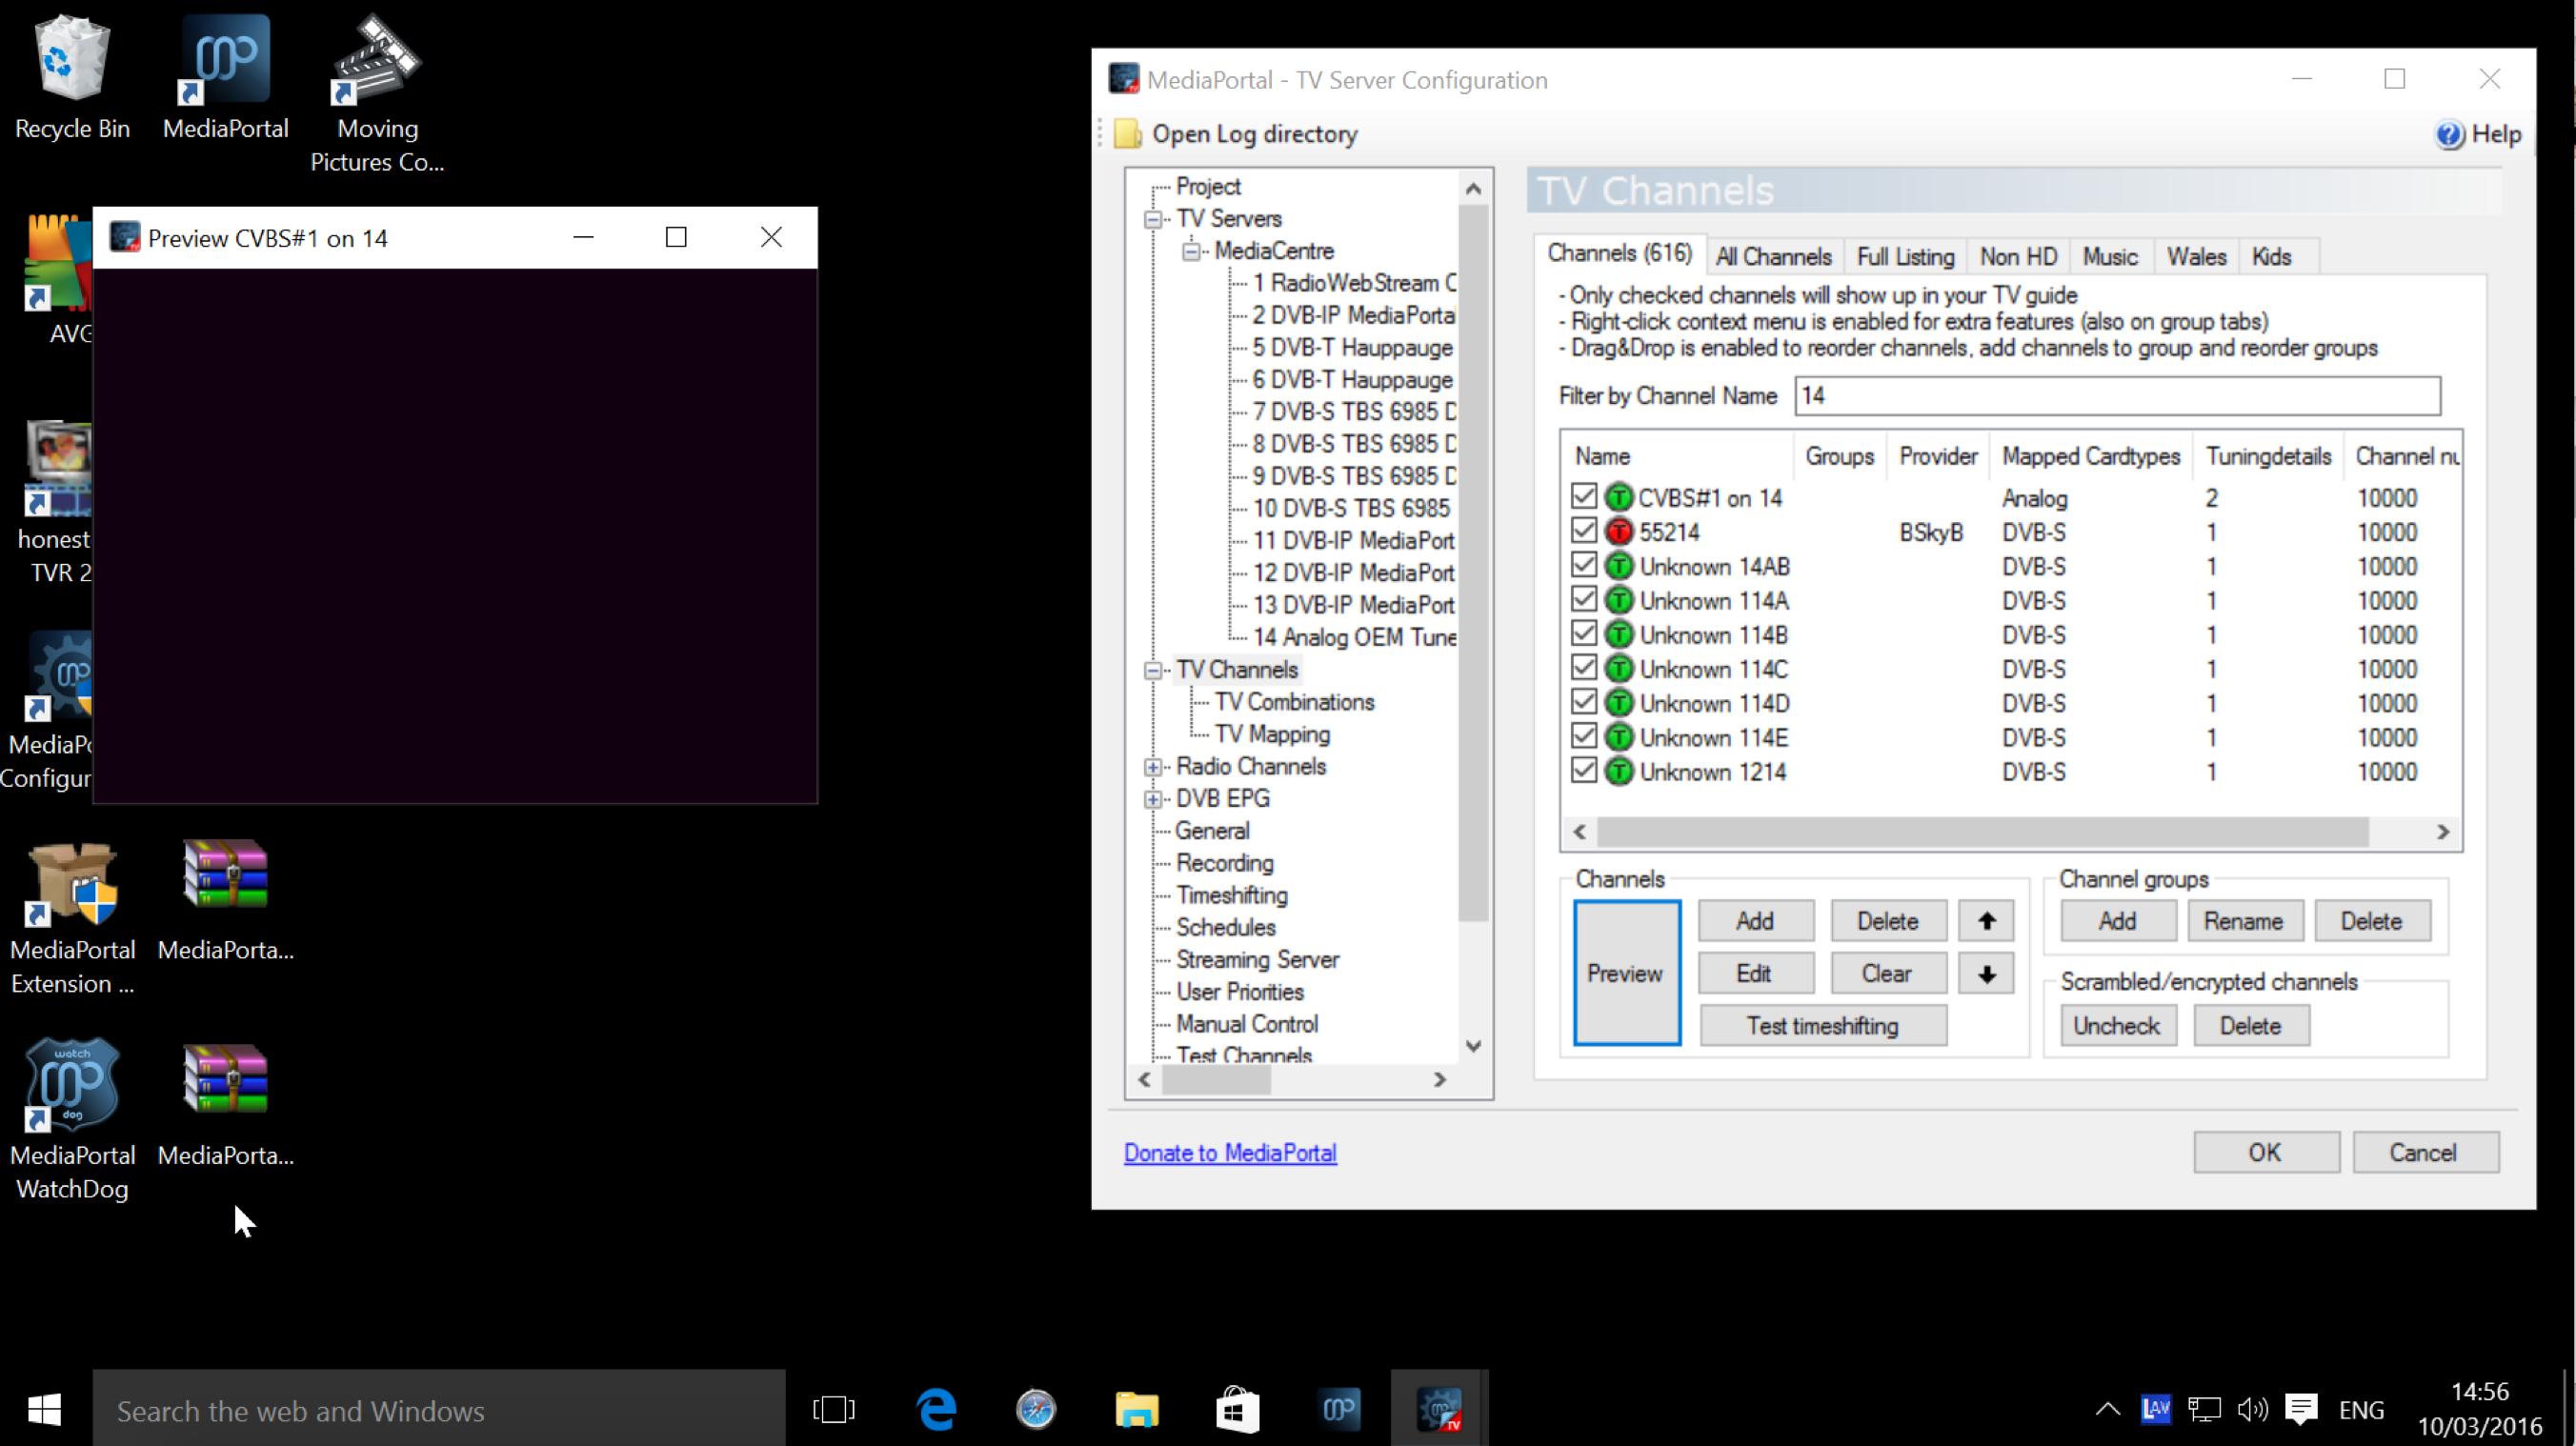 Honestech tvr 2.5 software download